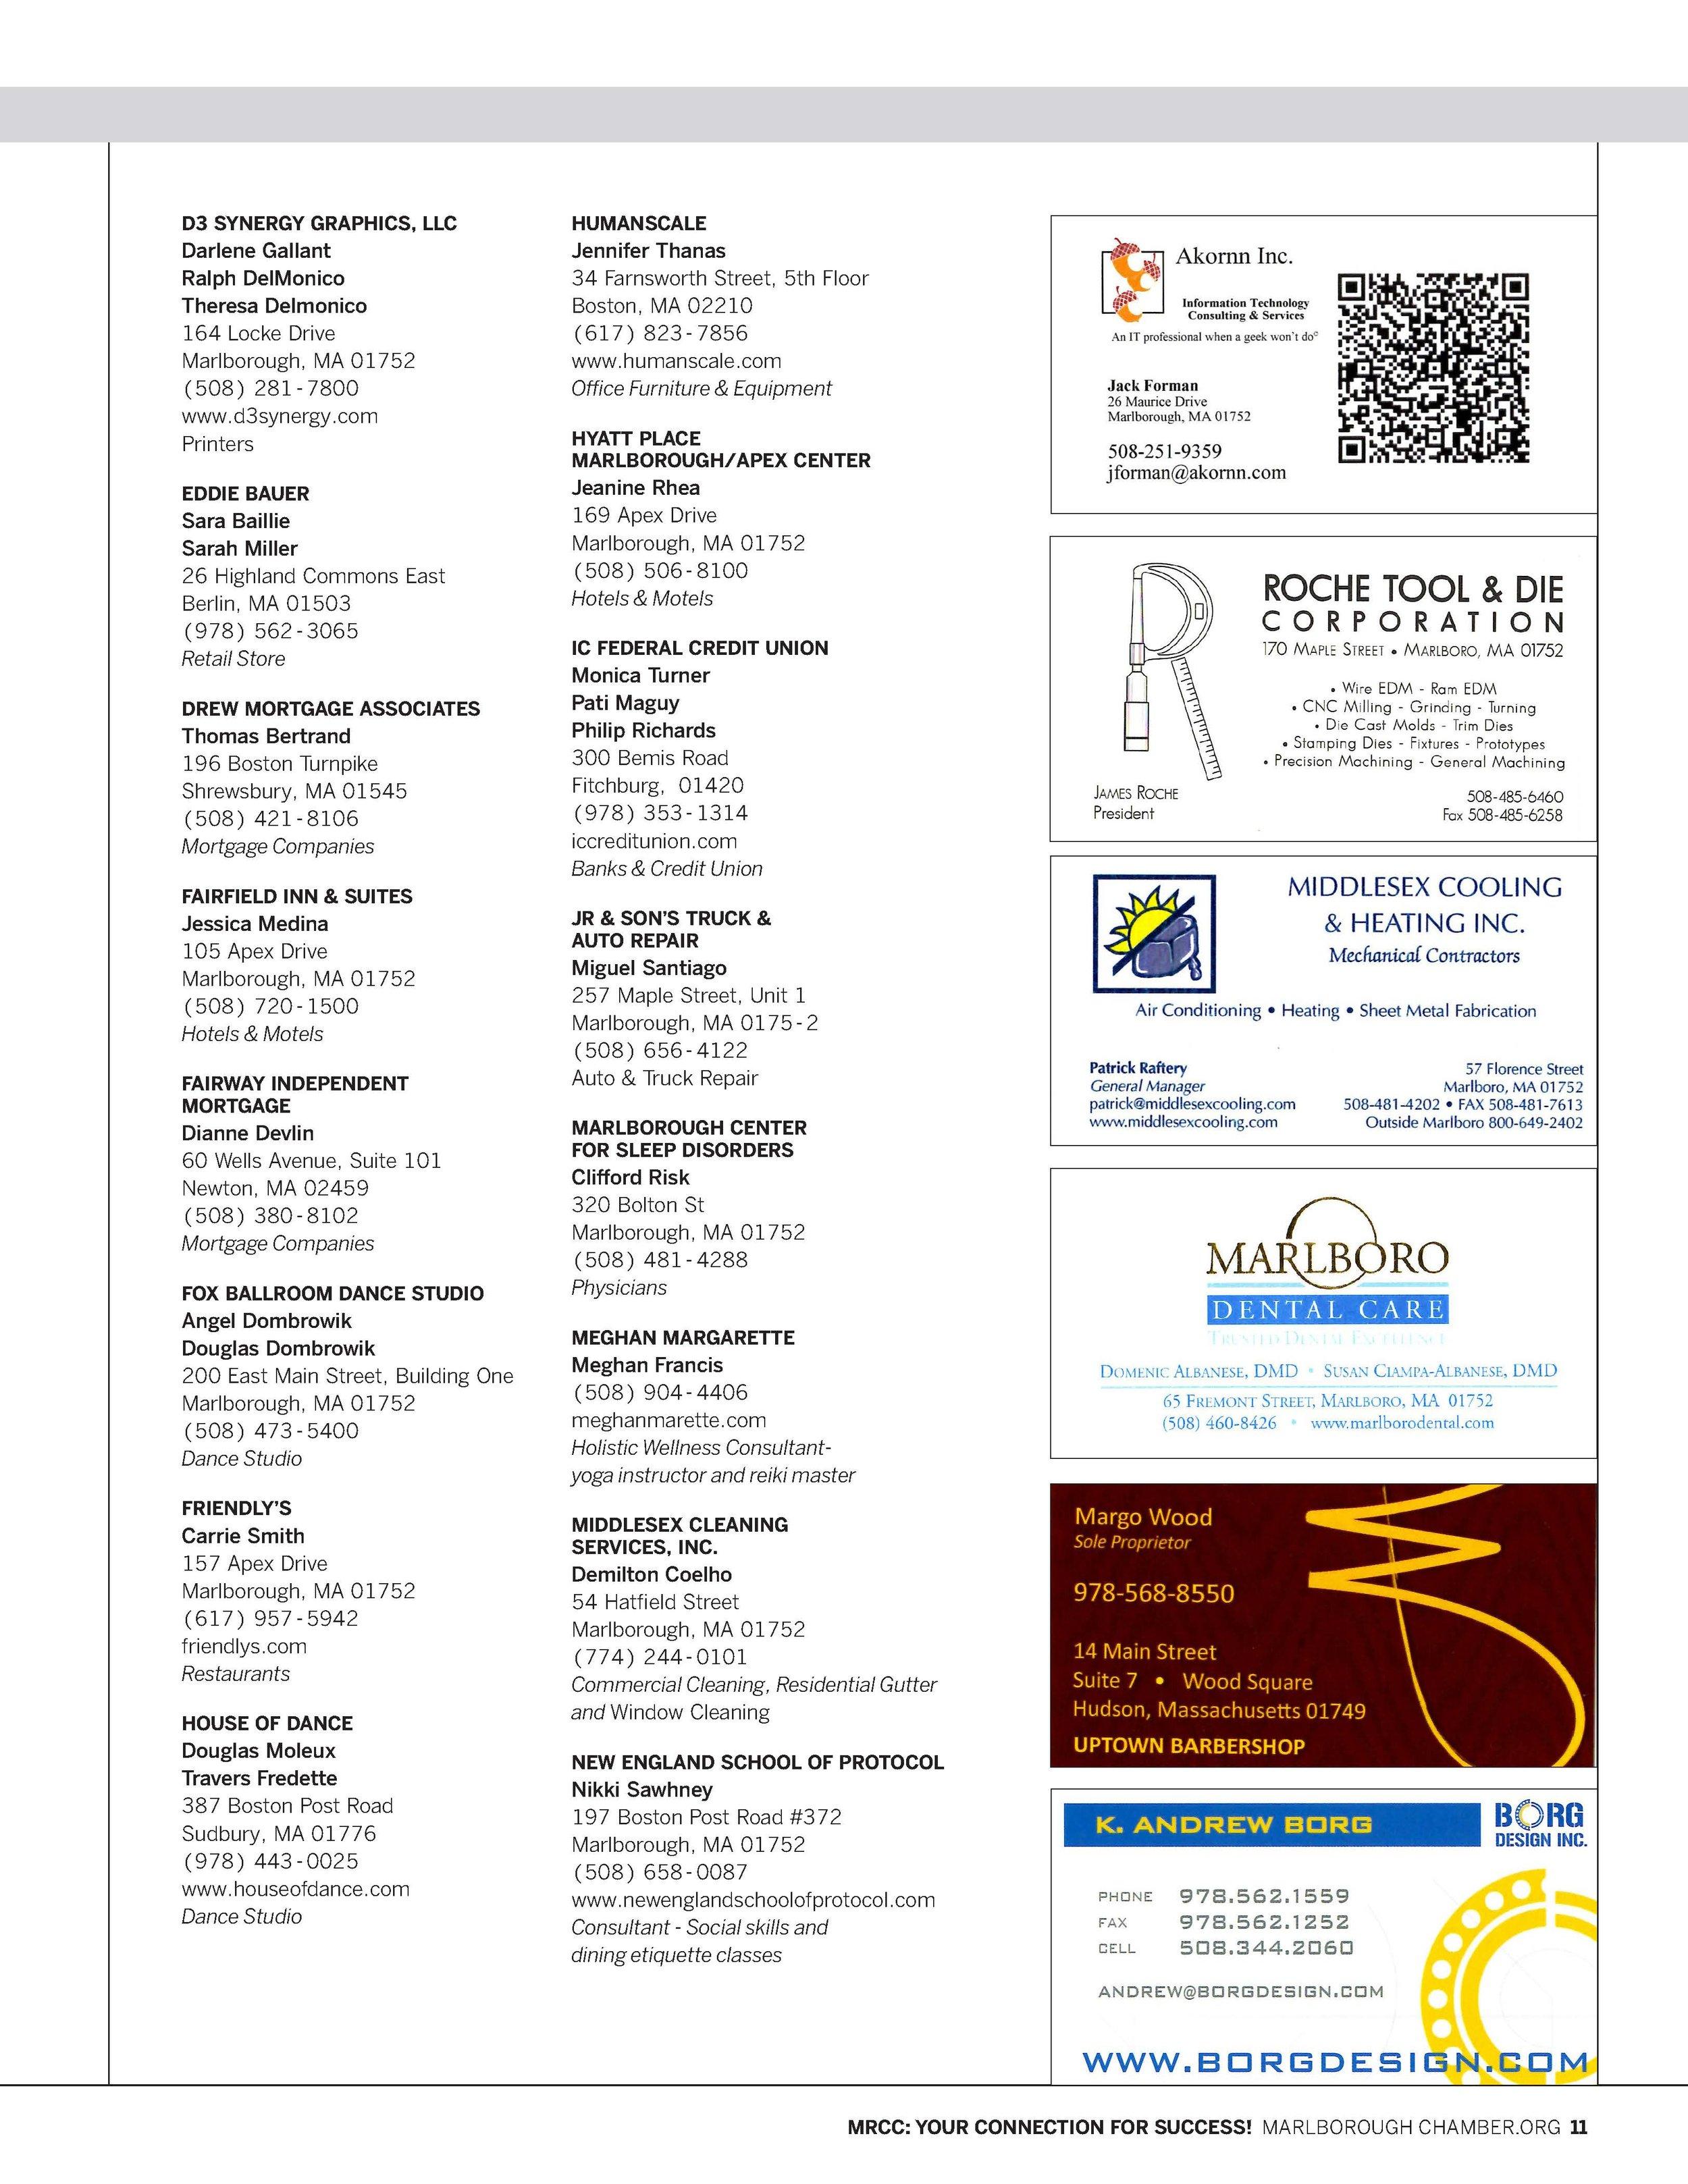 MRCC_Vol22017_final102517_Page_11.jpg